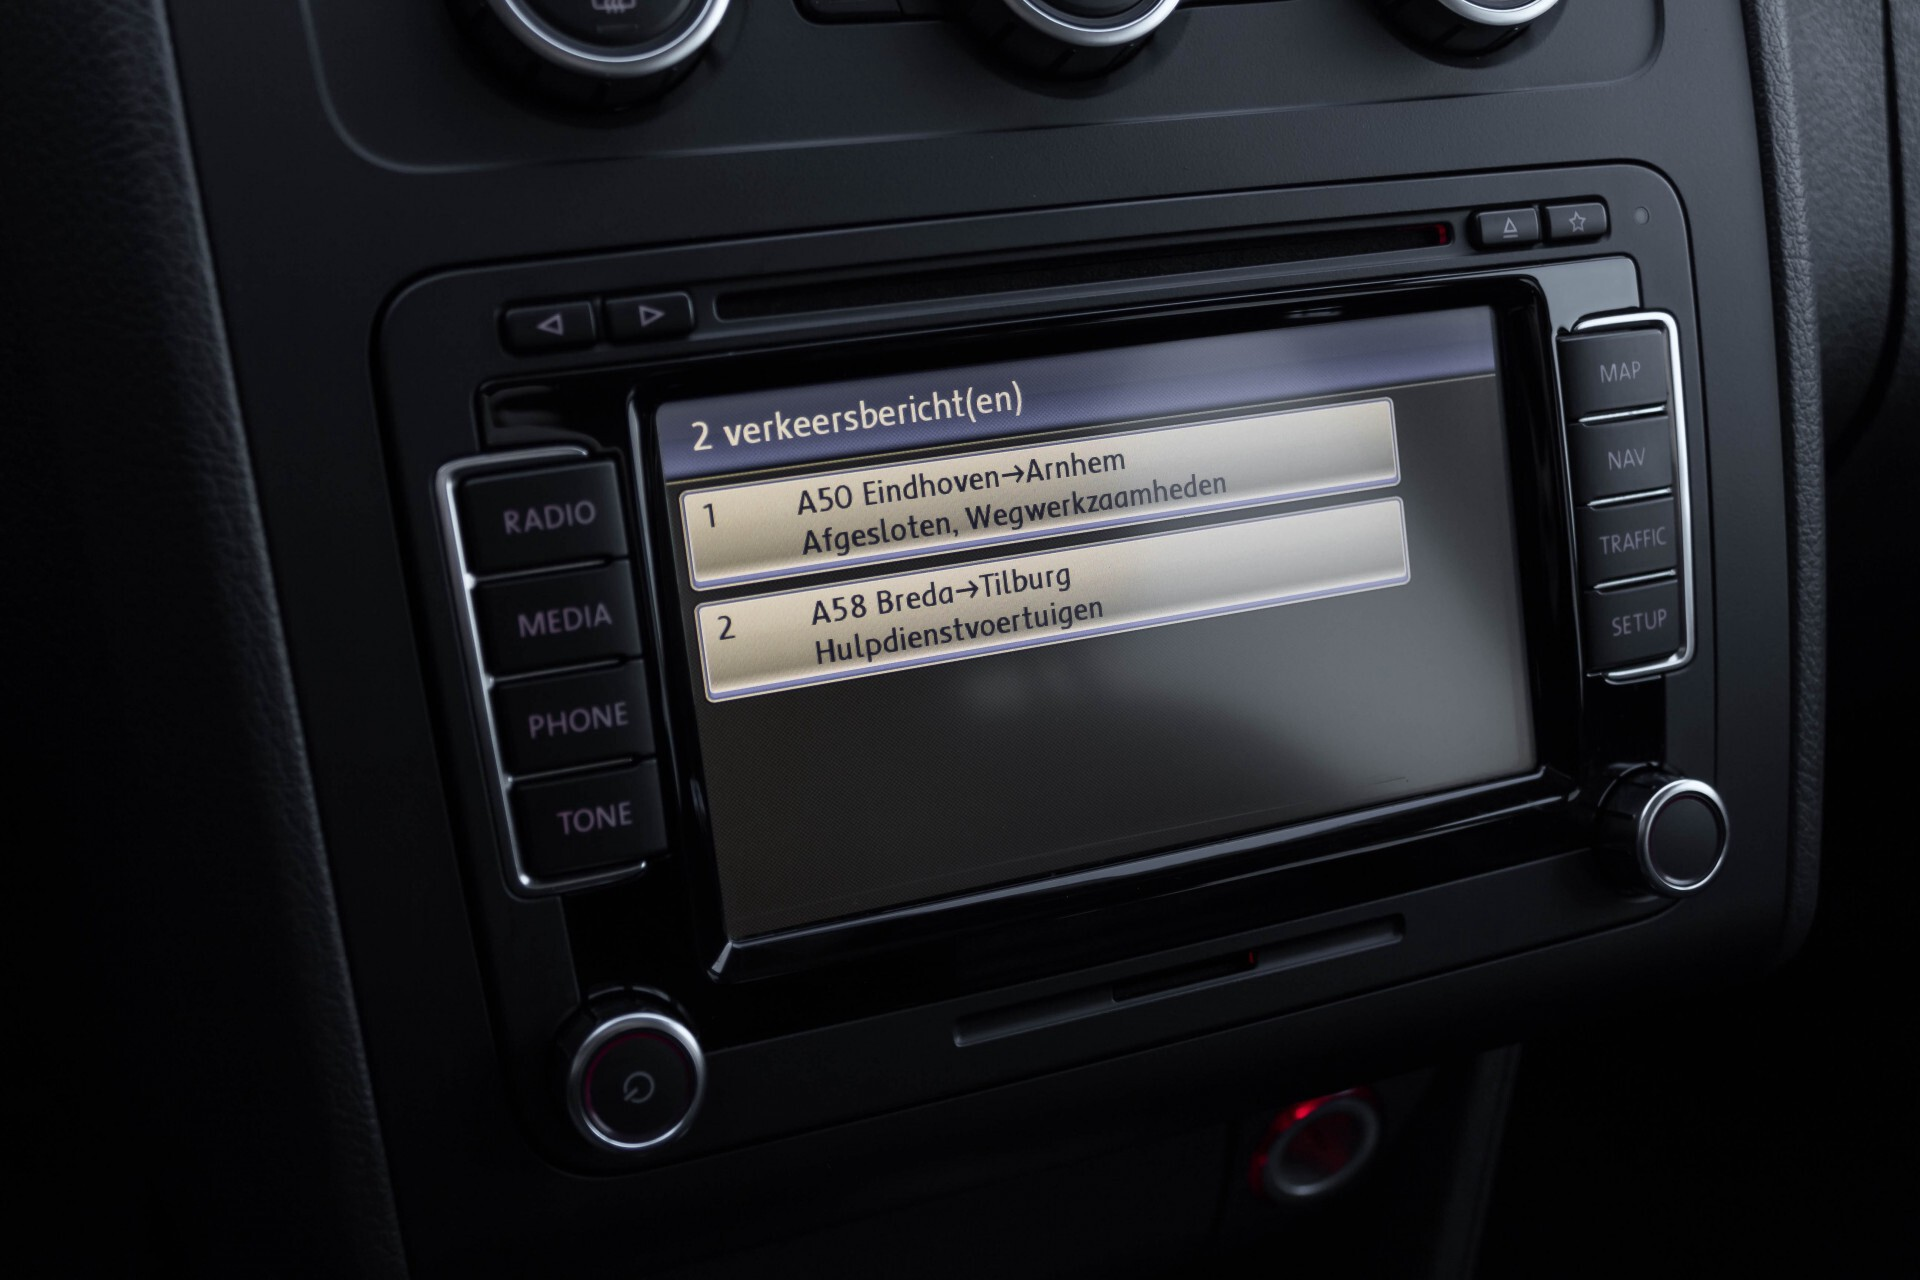 Volkswagen Touran 2.0 TDI Highline 7Persoons 177pk Panorama/Leder/Navi/Camera/Verw-Stln/Trhk/ECC/Xenon Aut Foto 27